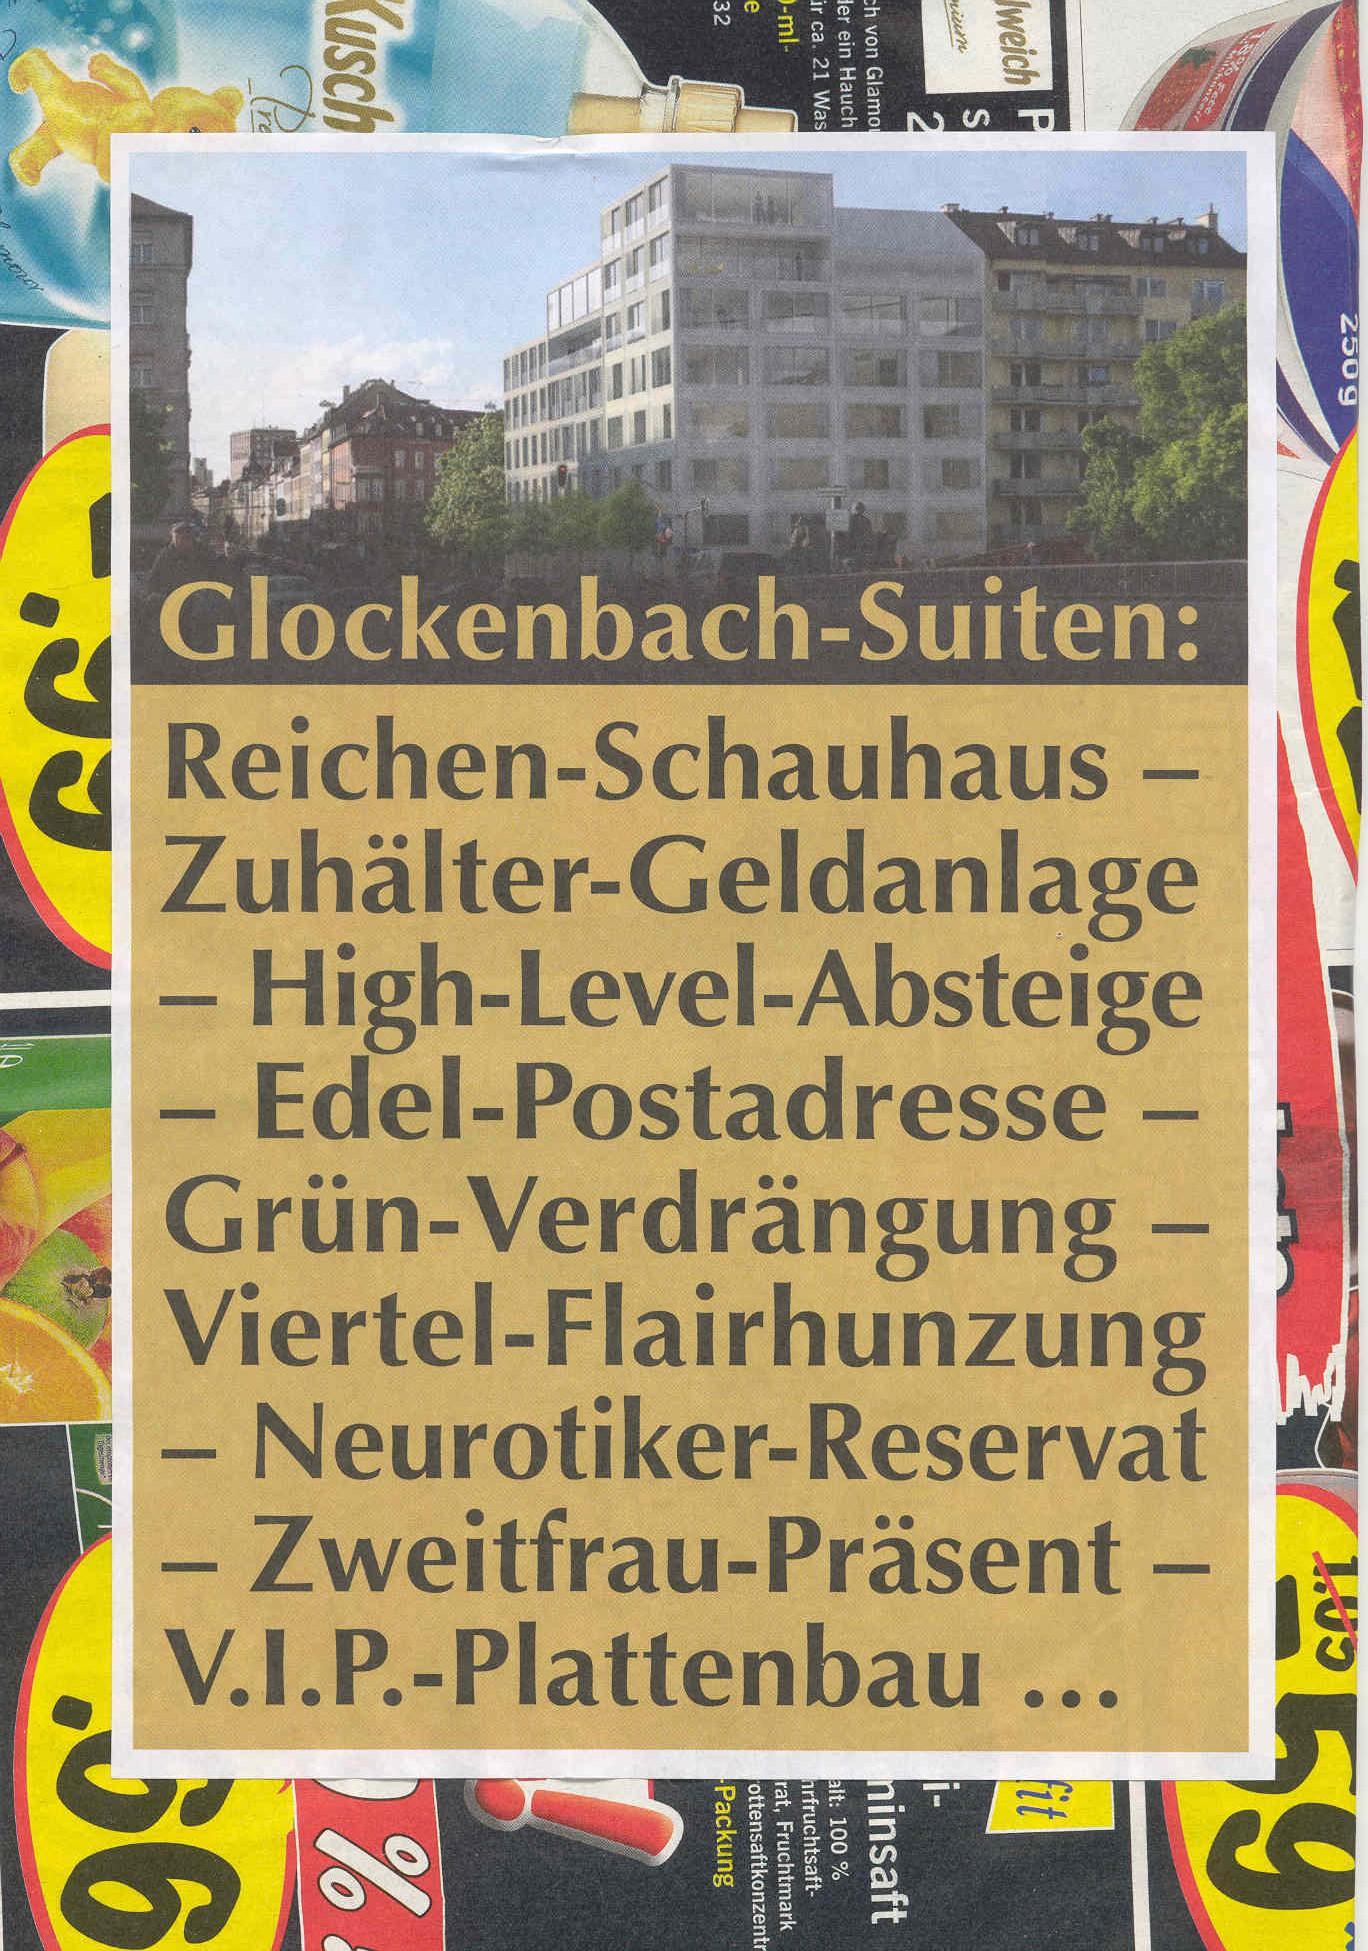 Fundstück im Glockenbachbach